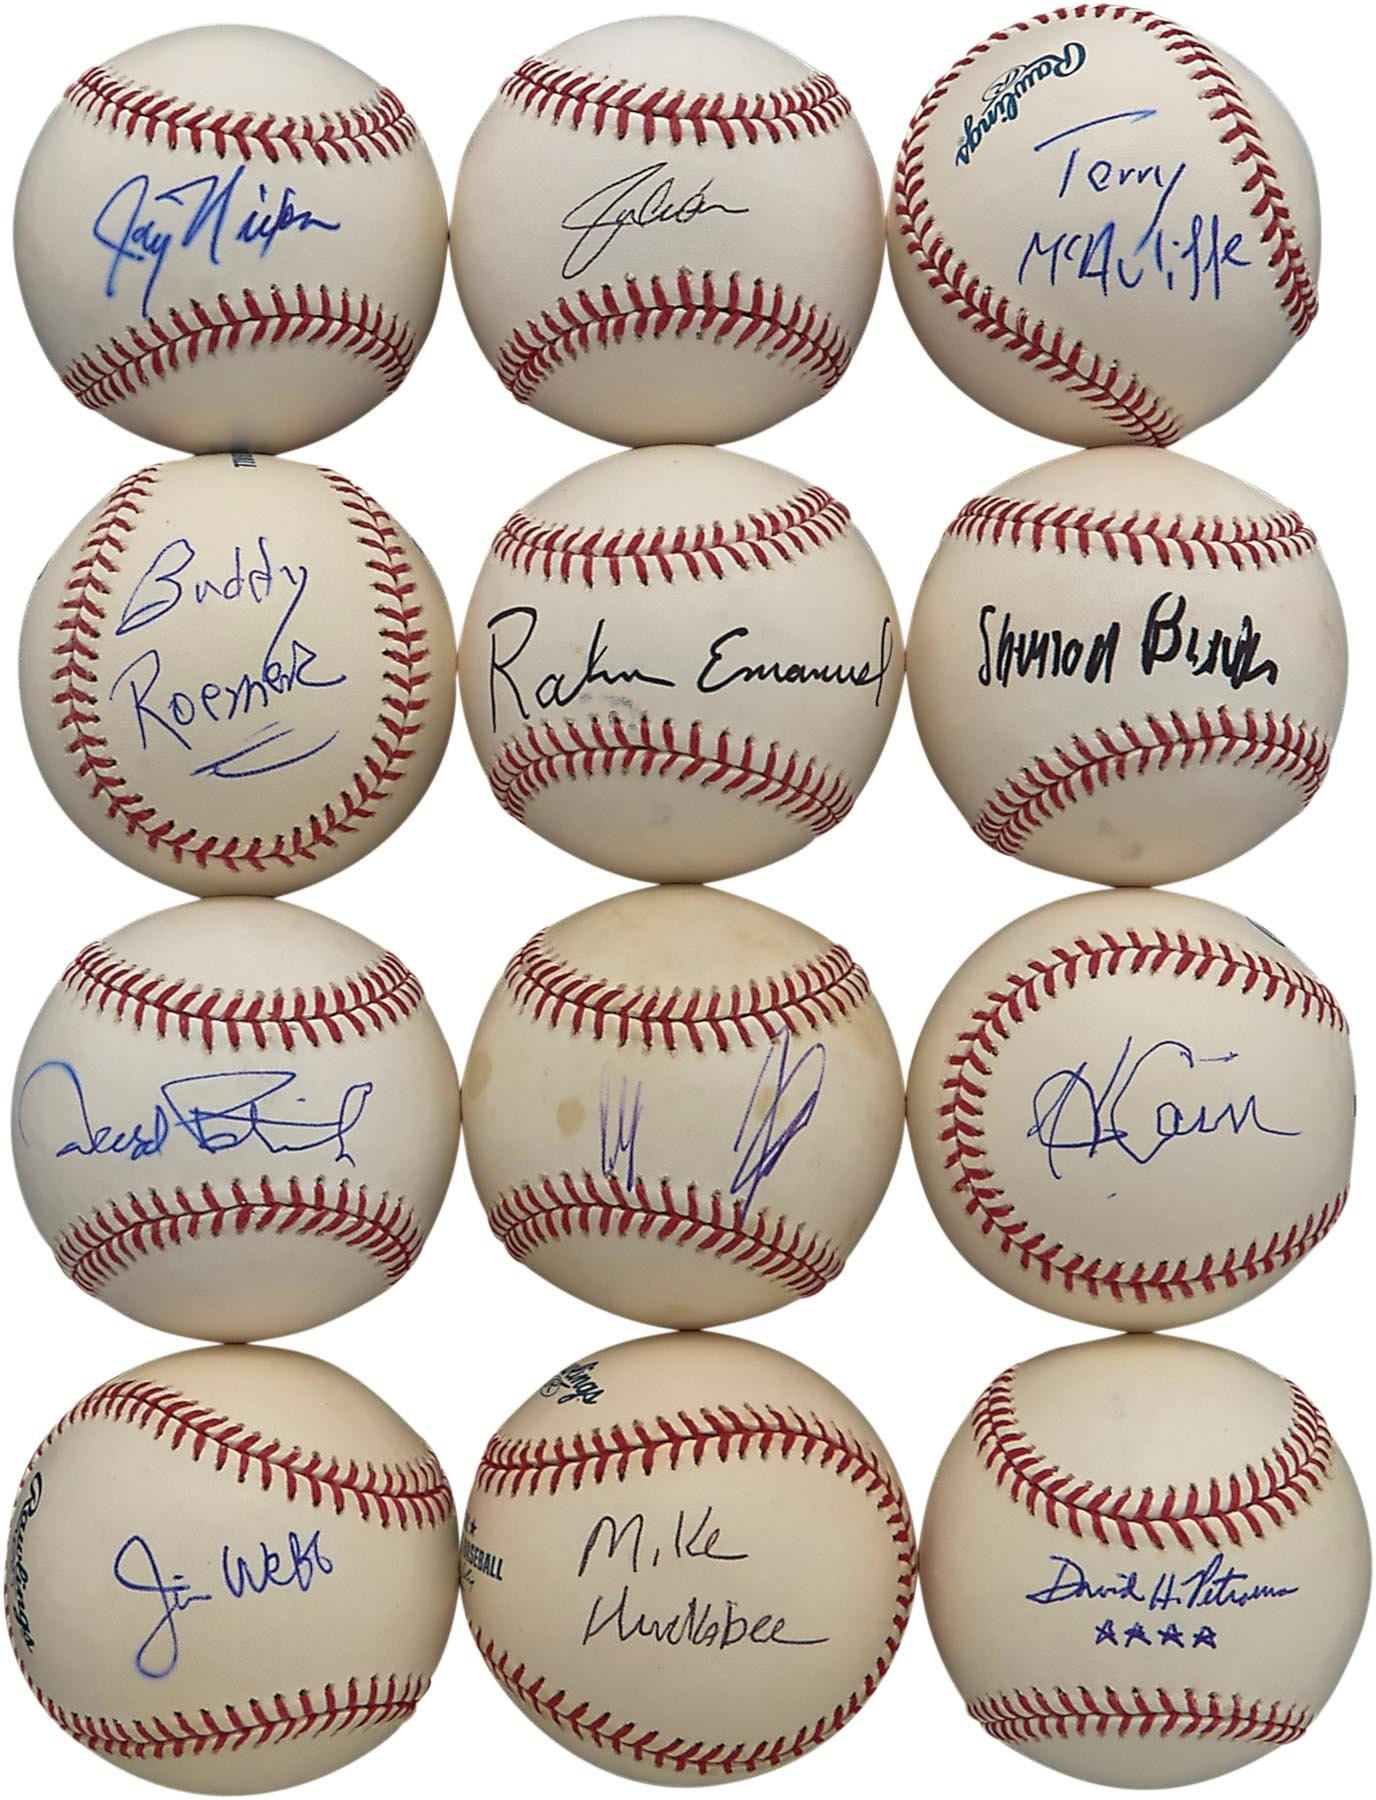 Frank Howard Signed Baseball Coa Jsa Excellent In Cushion Effect Baseball-mlb Sports Mem, Cards & Fan Shop